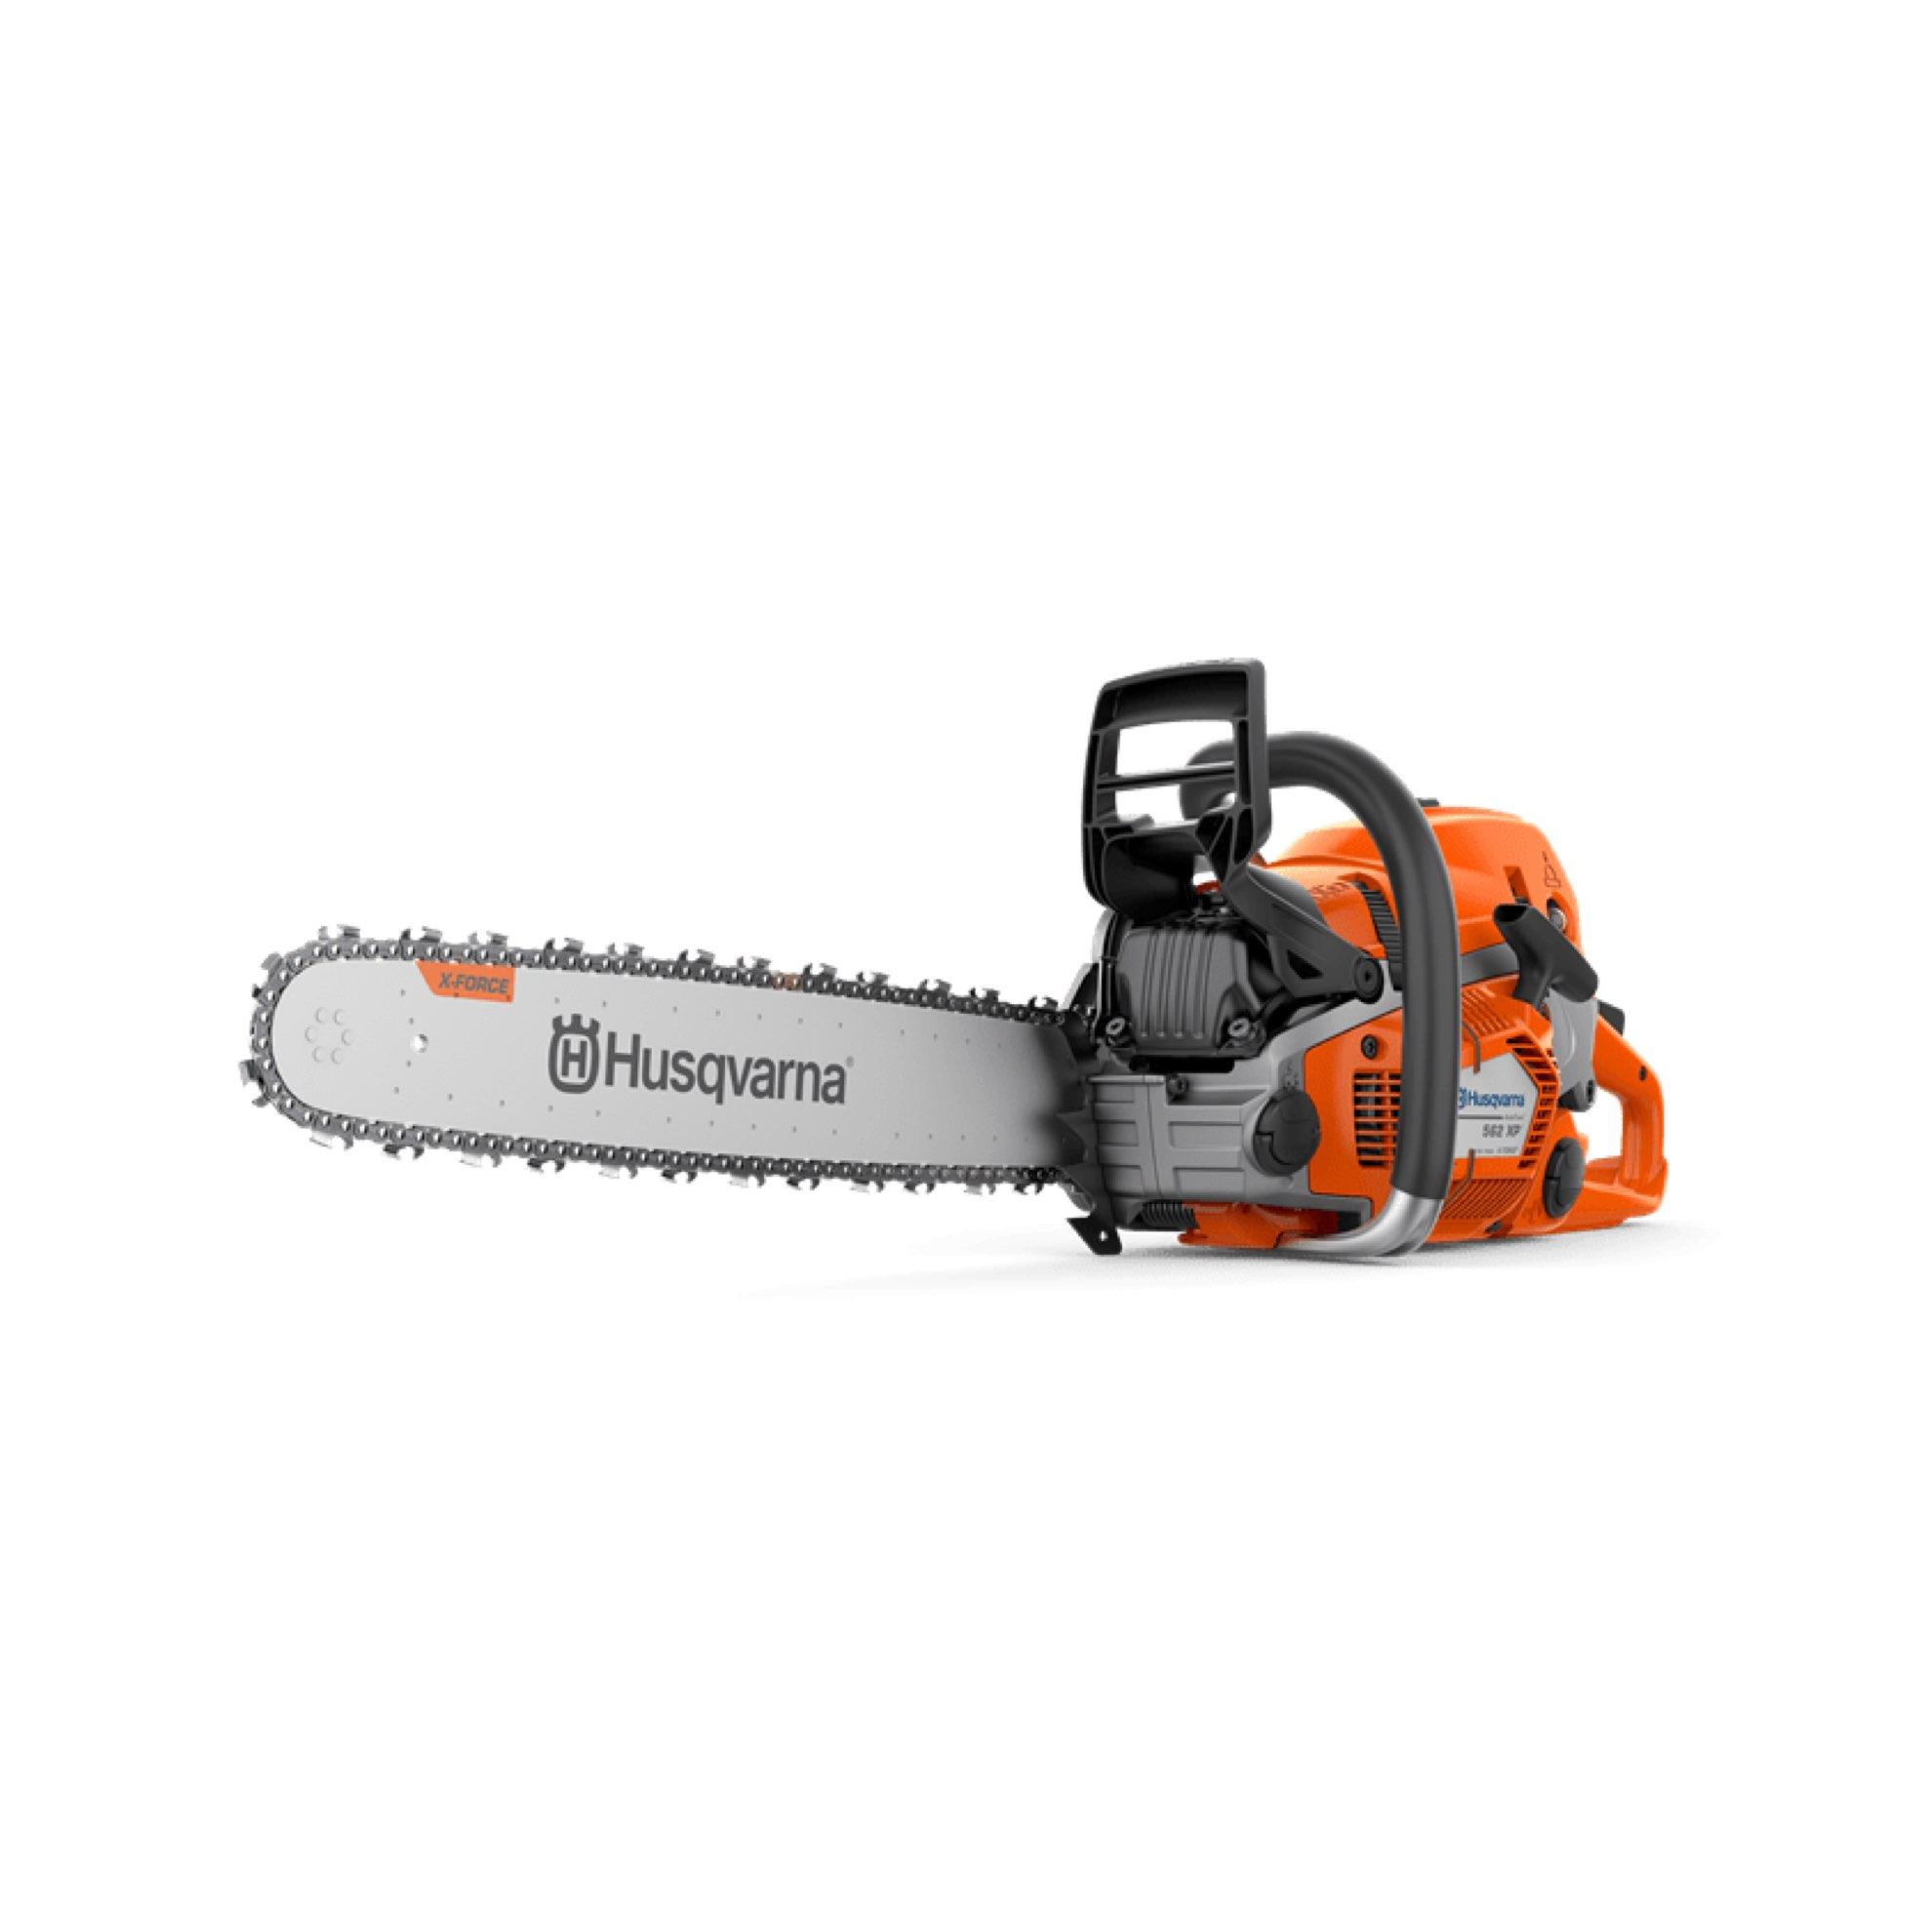 Husqvarna 562 XP® Petrol-powered Chainsaw